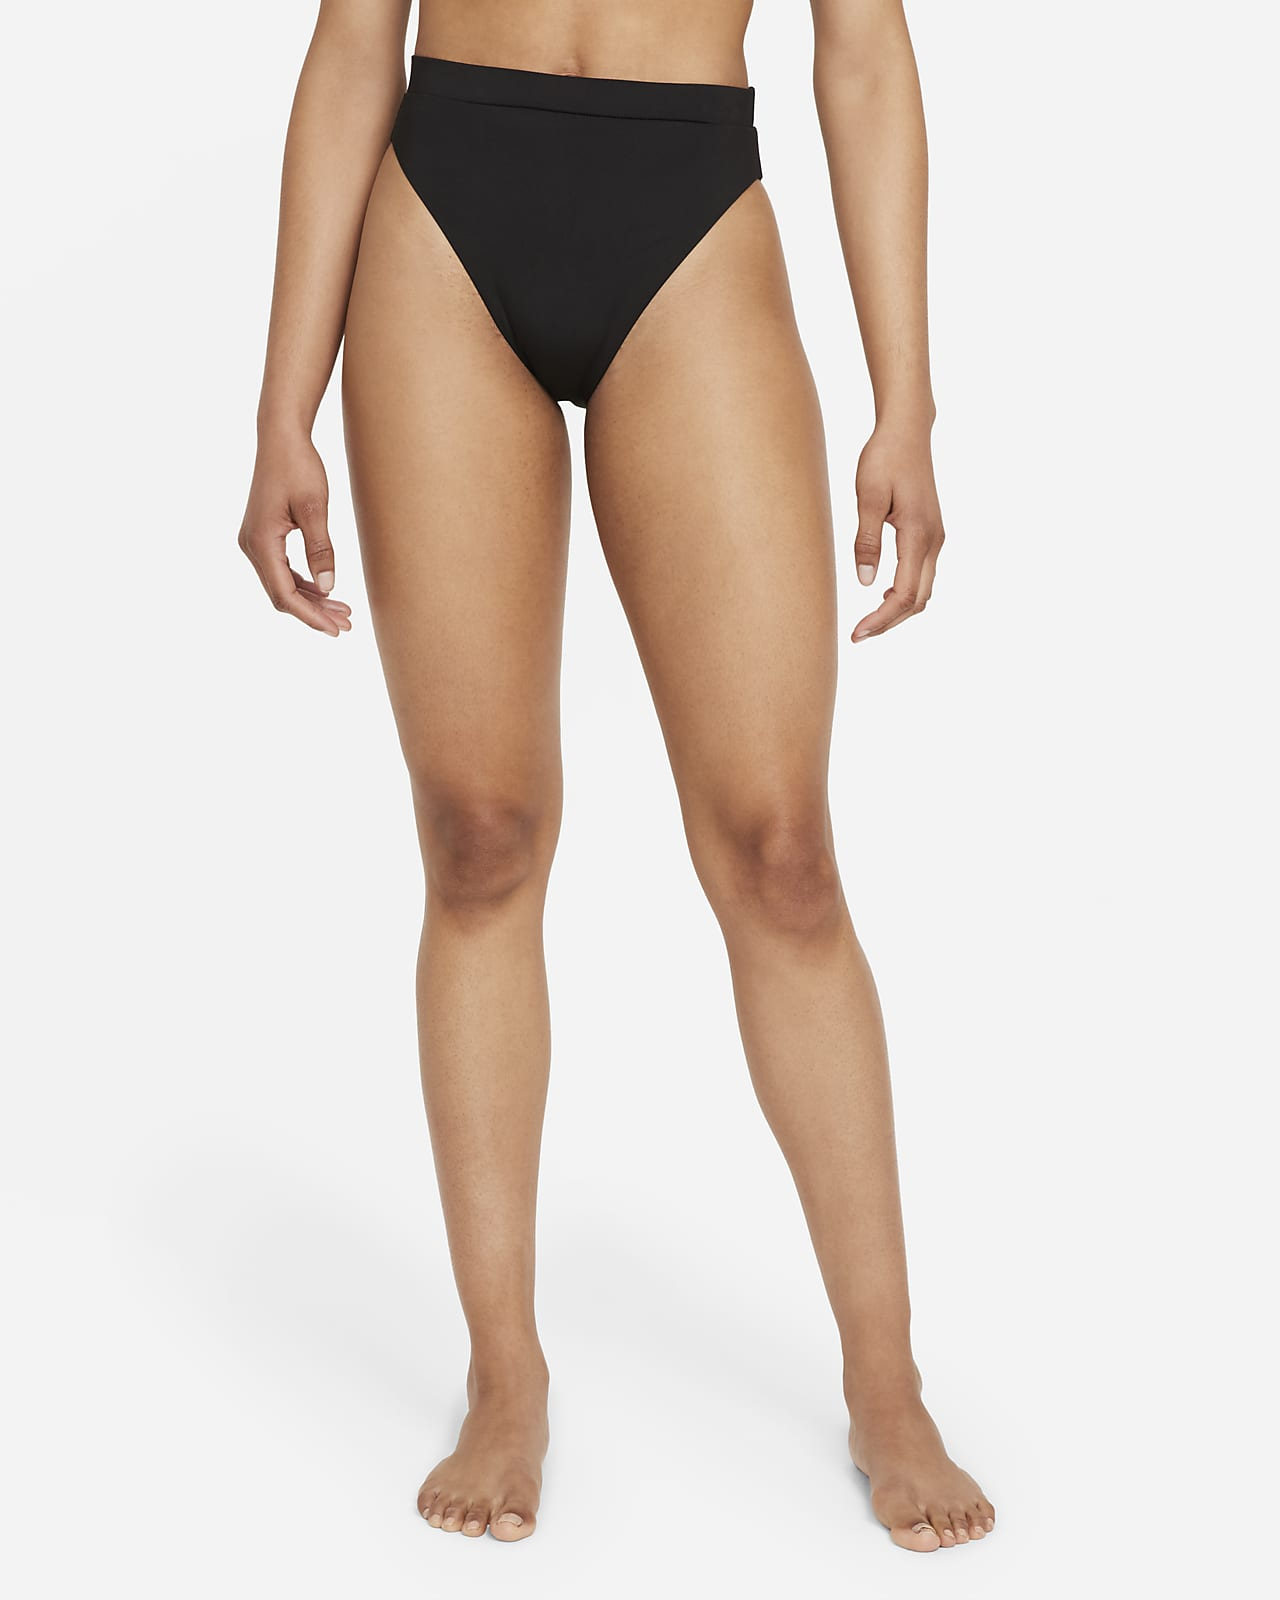 Nike Essential Women's High-Waist Swim Bottom